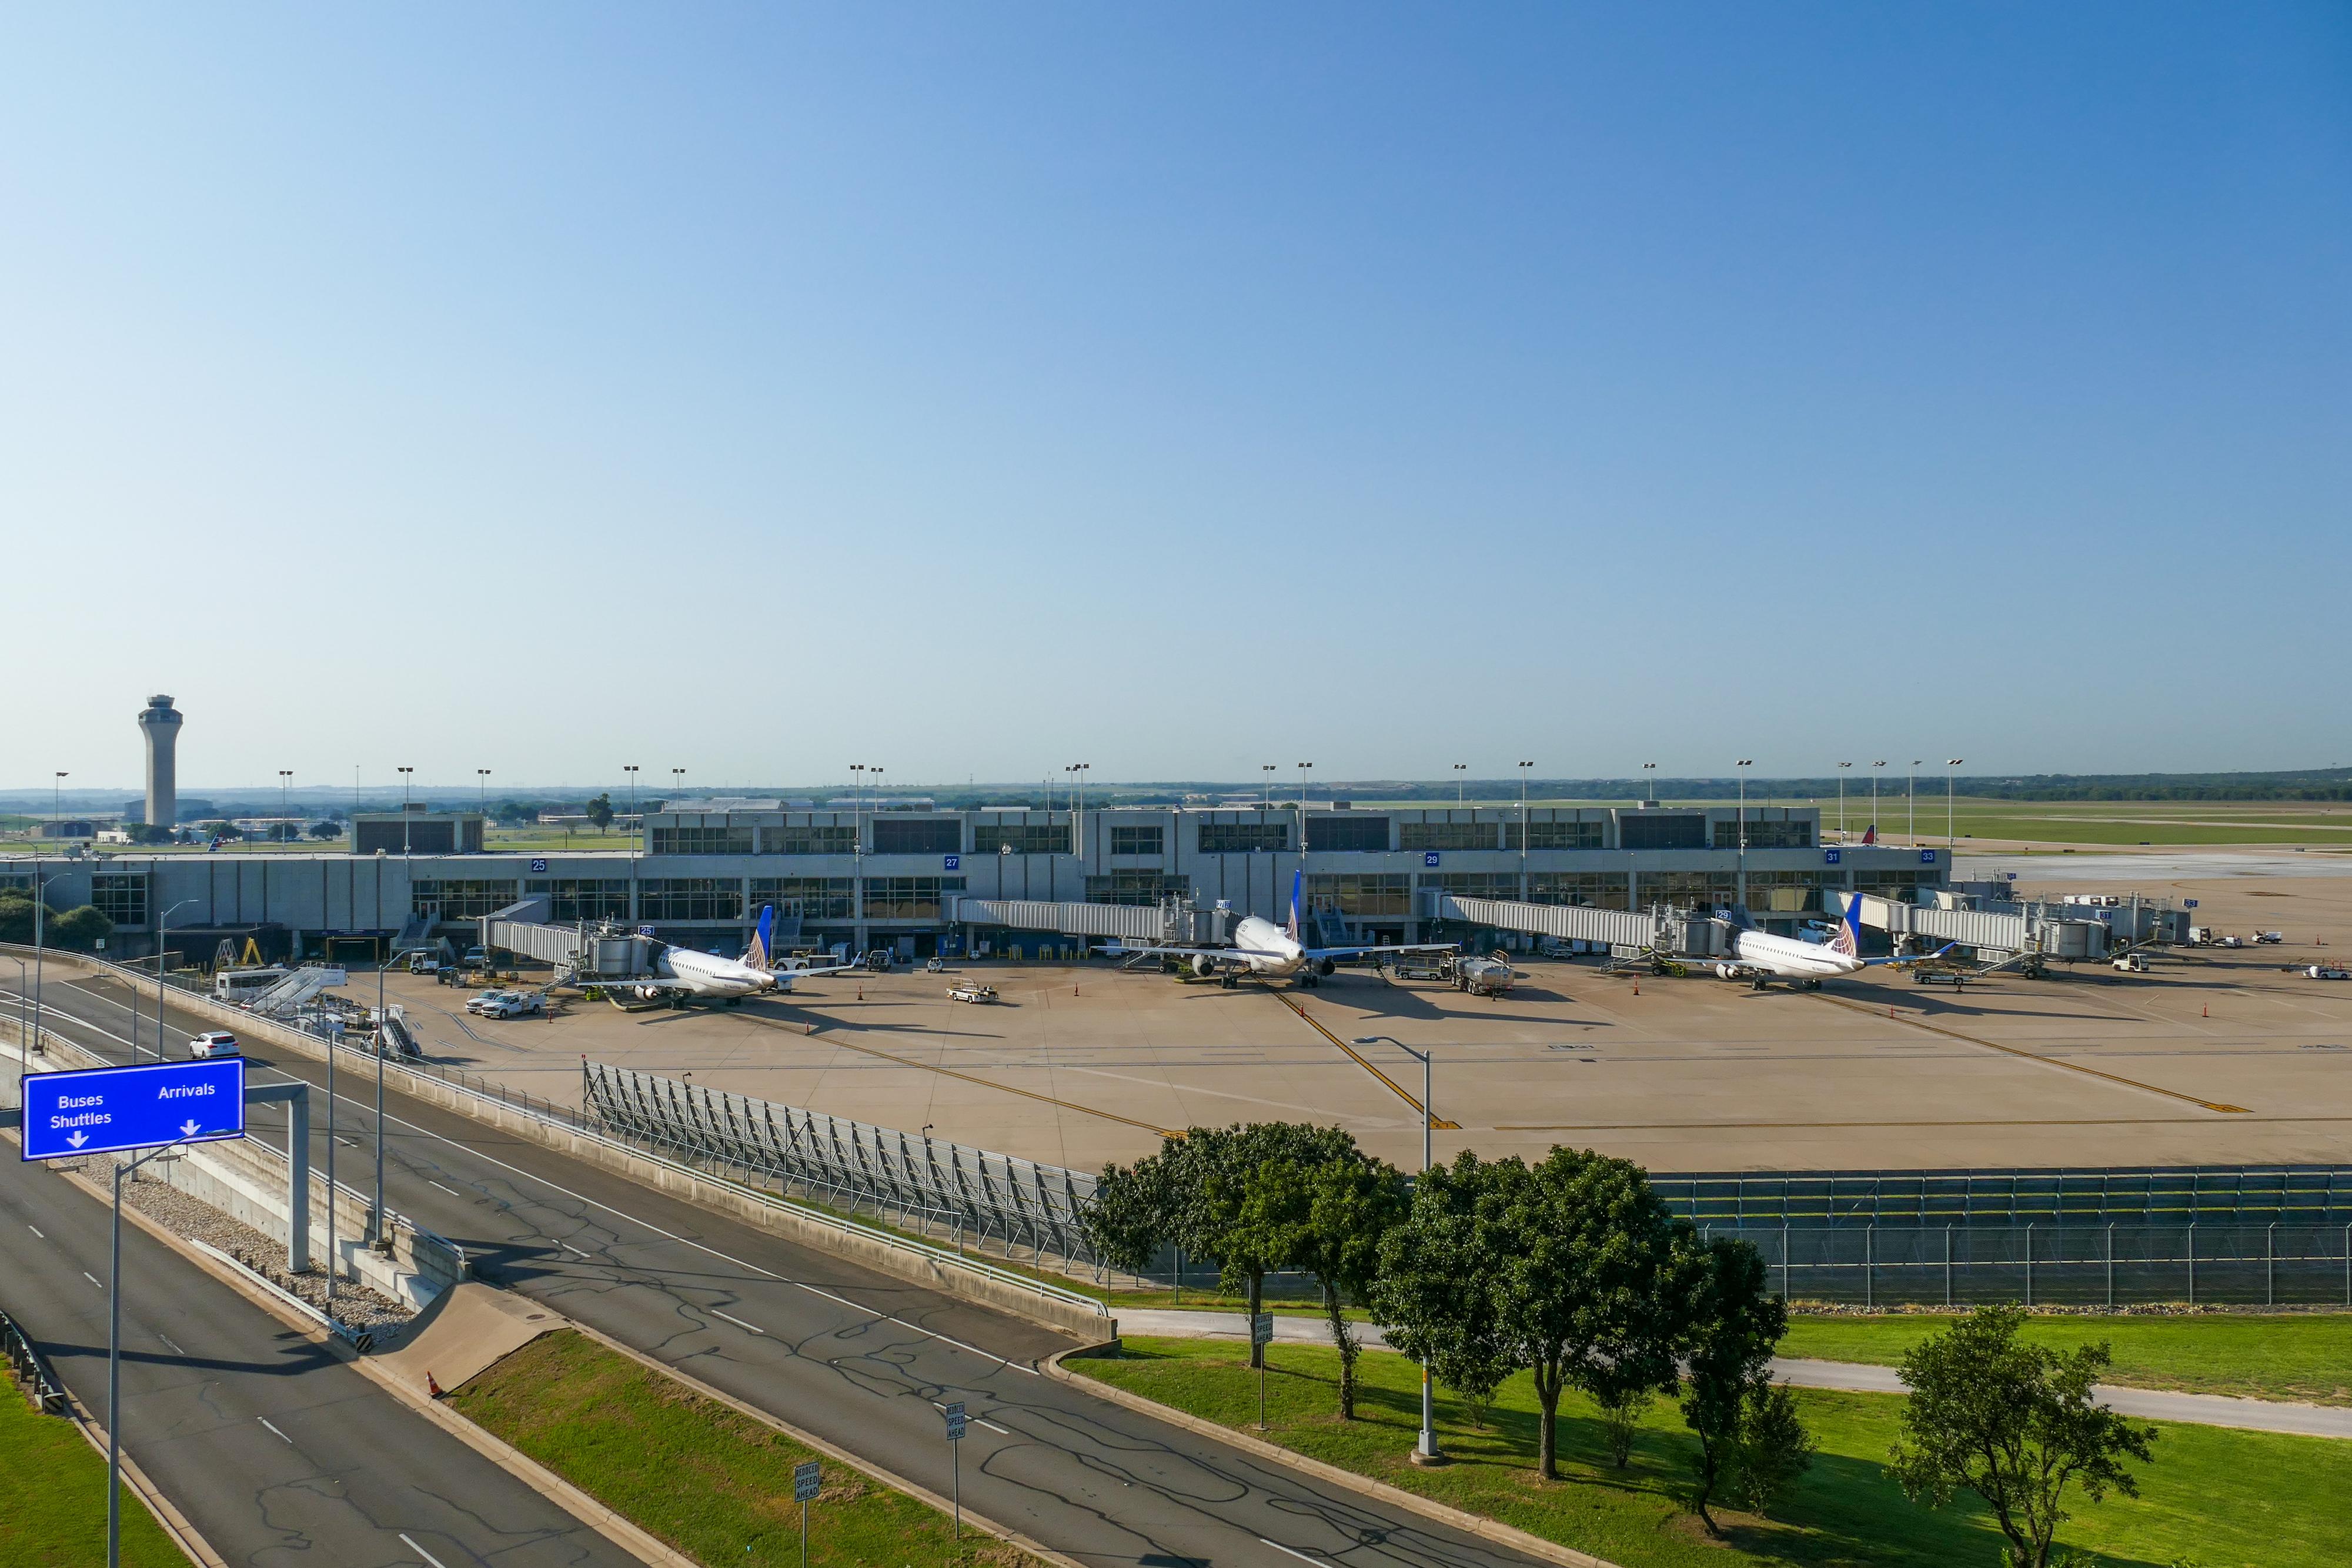 Photo of KAUS - Airport Photo at AUS